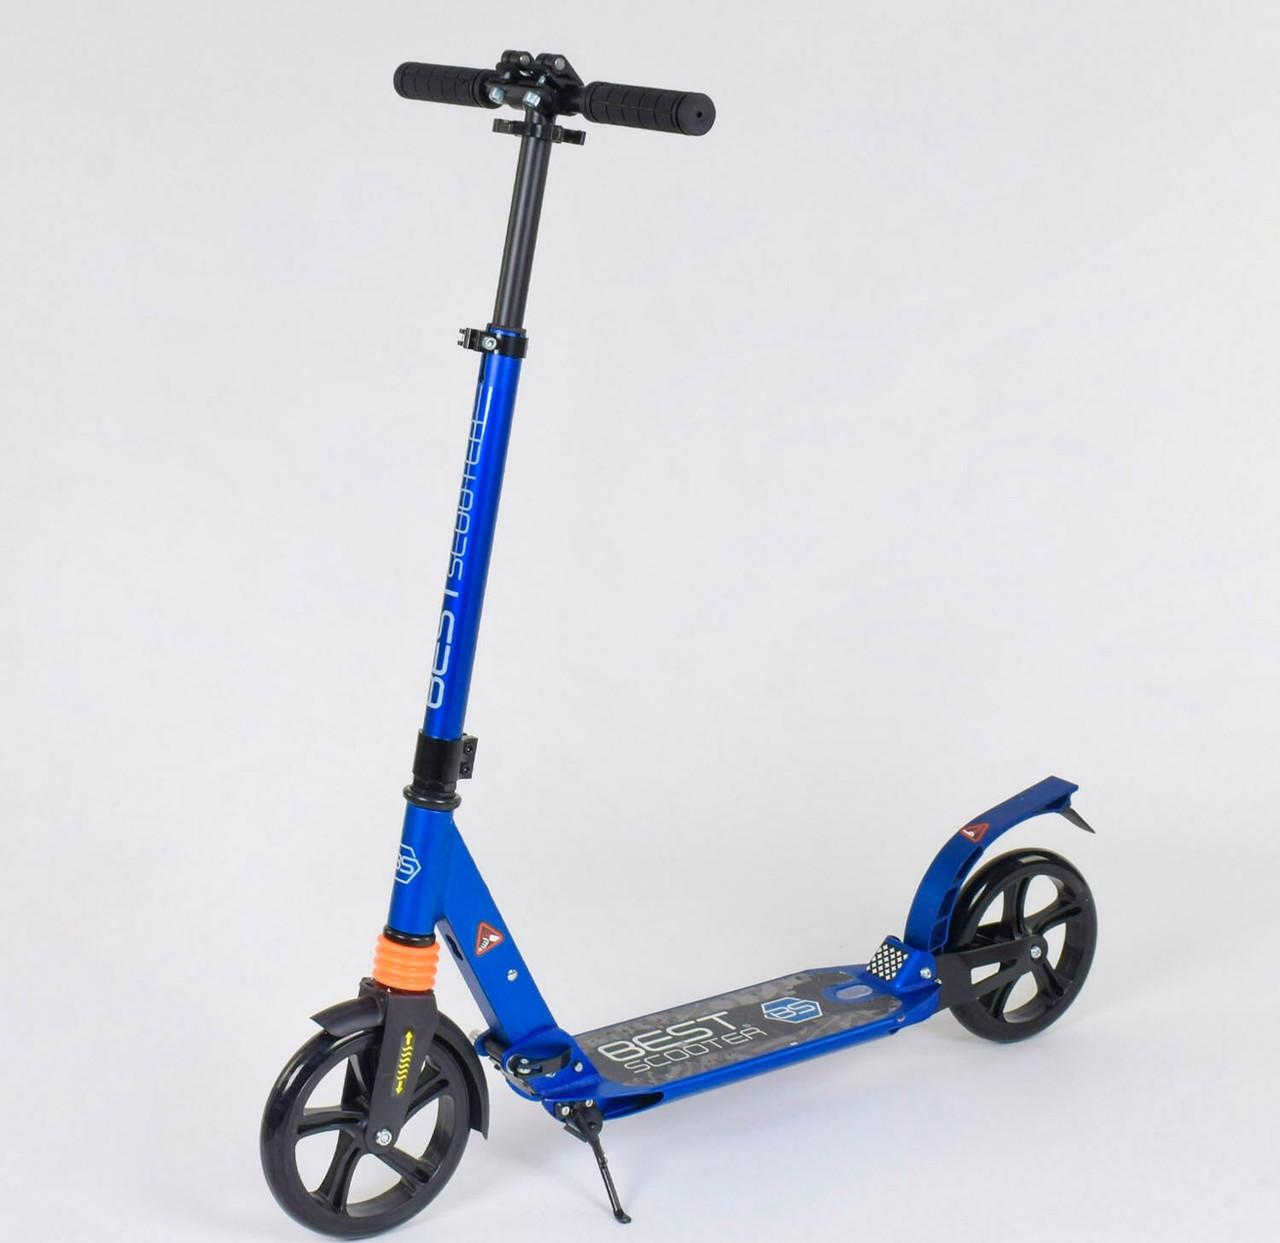 Самокат алюминиевый 020692 Best Scooter, СИНИЙ